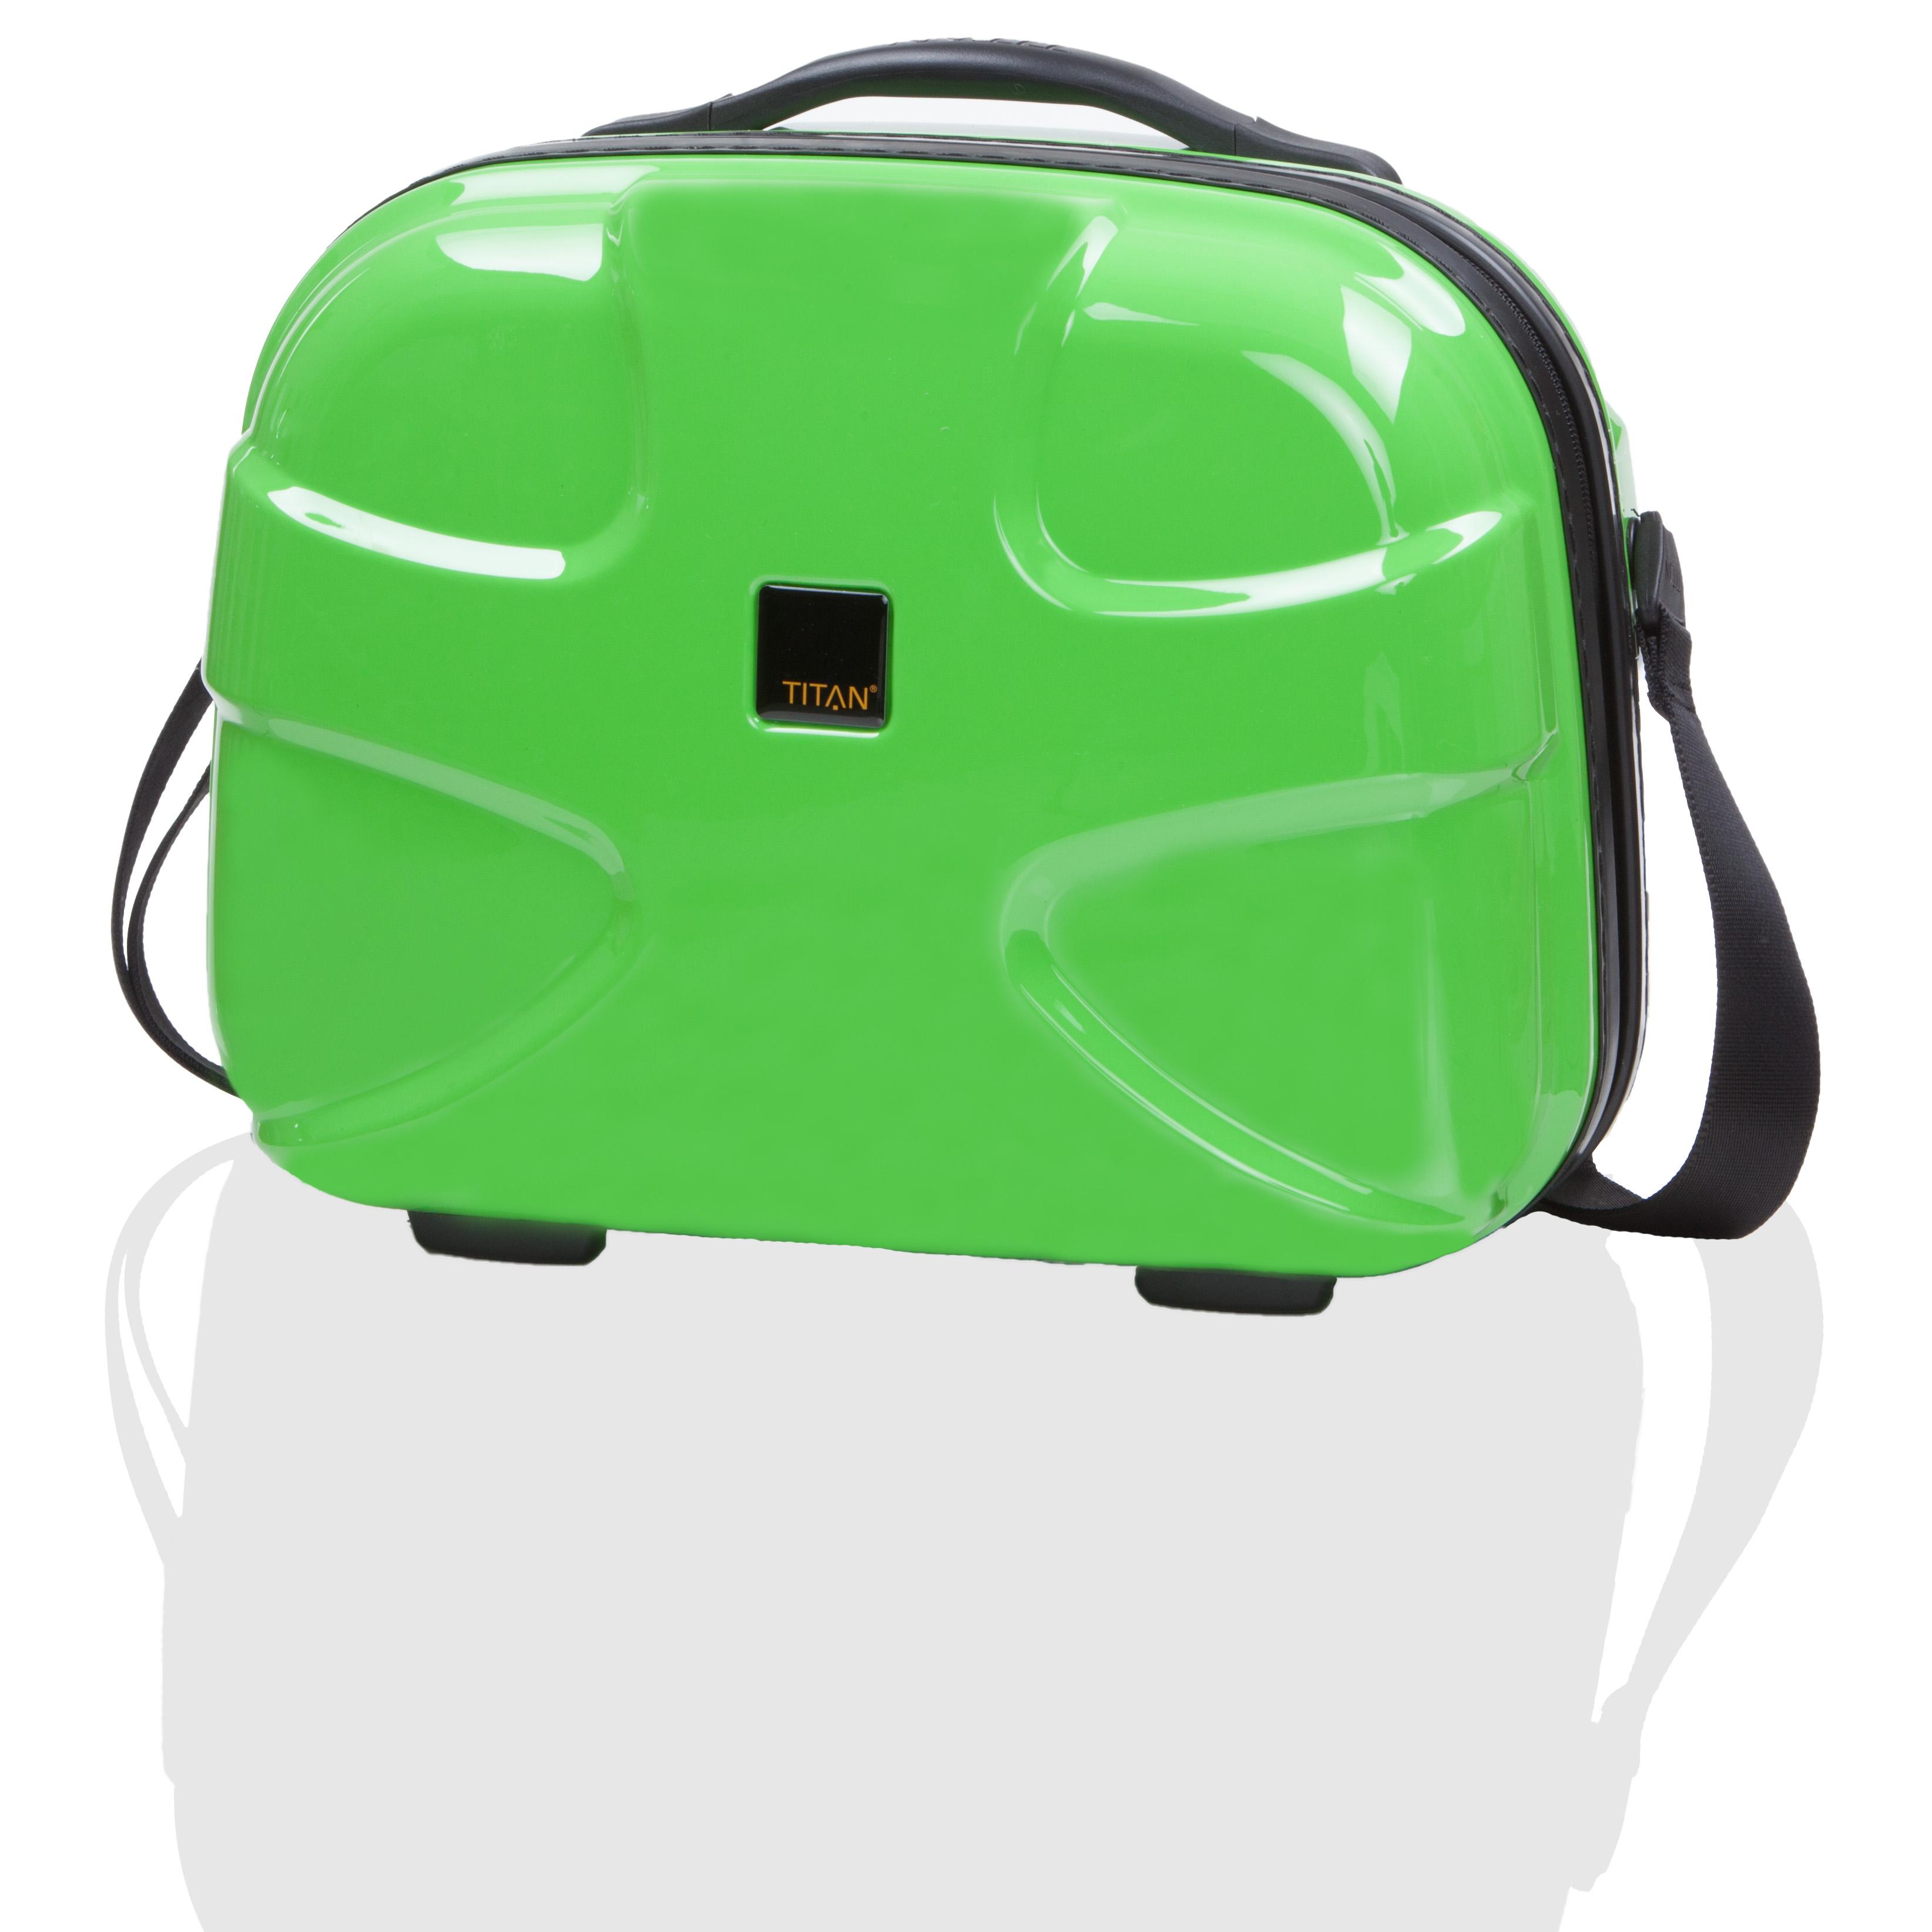 Titan X2 Flash Beauty Case Plasma Green